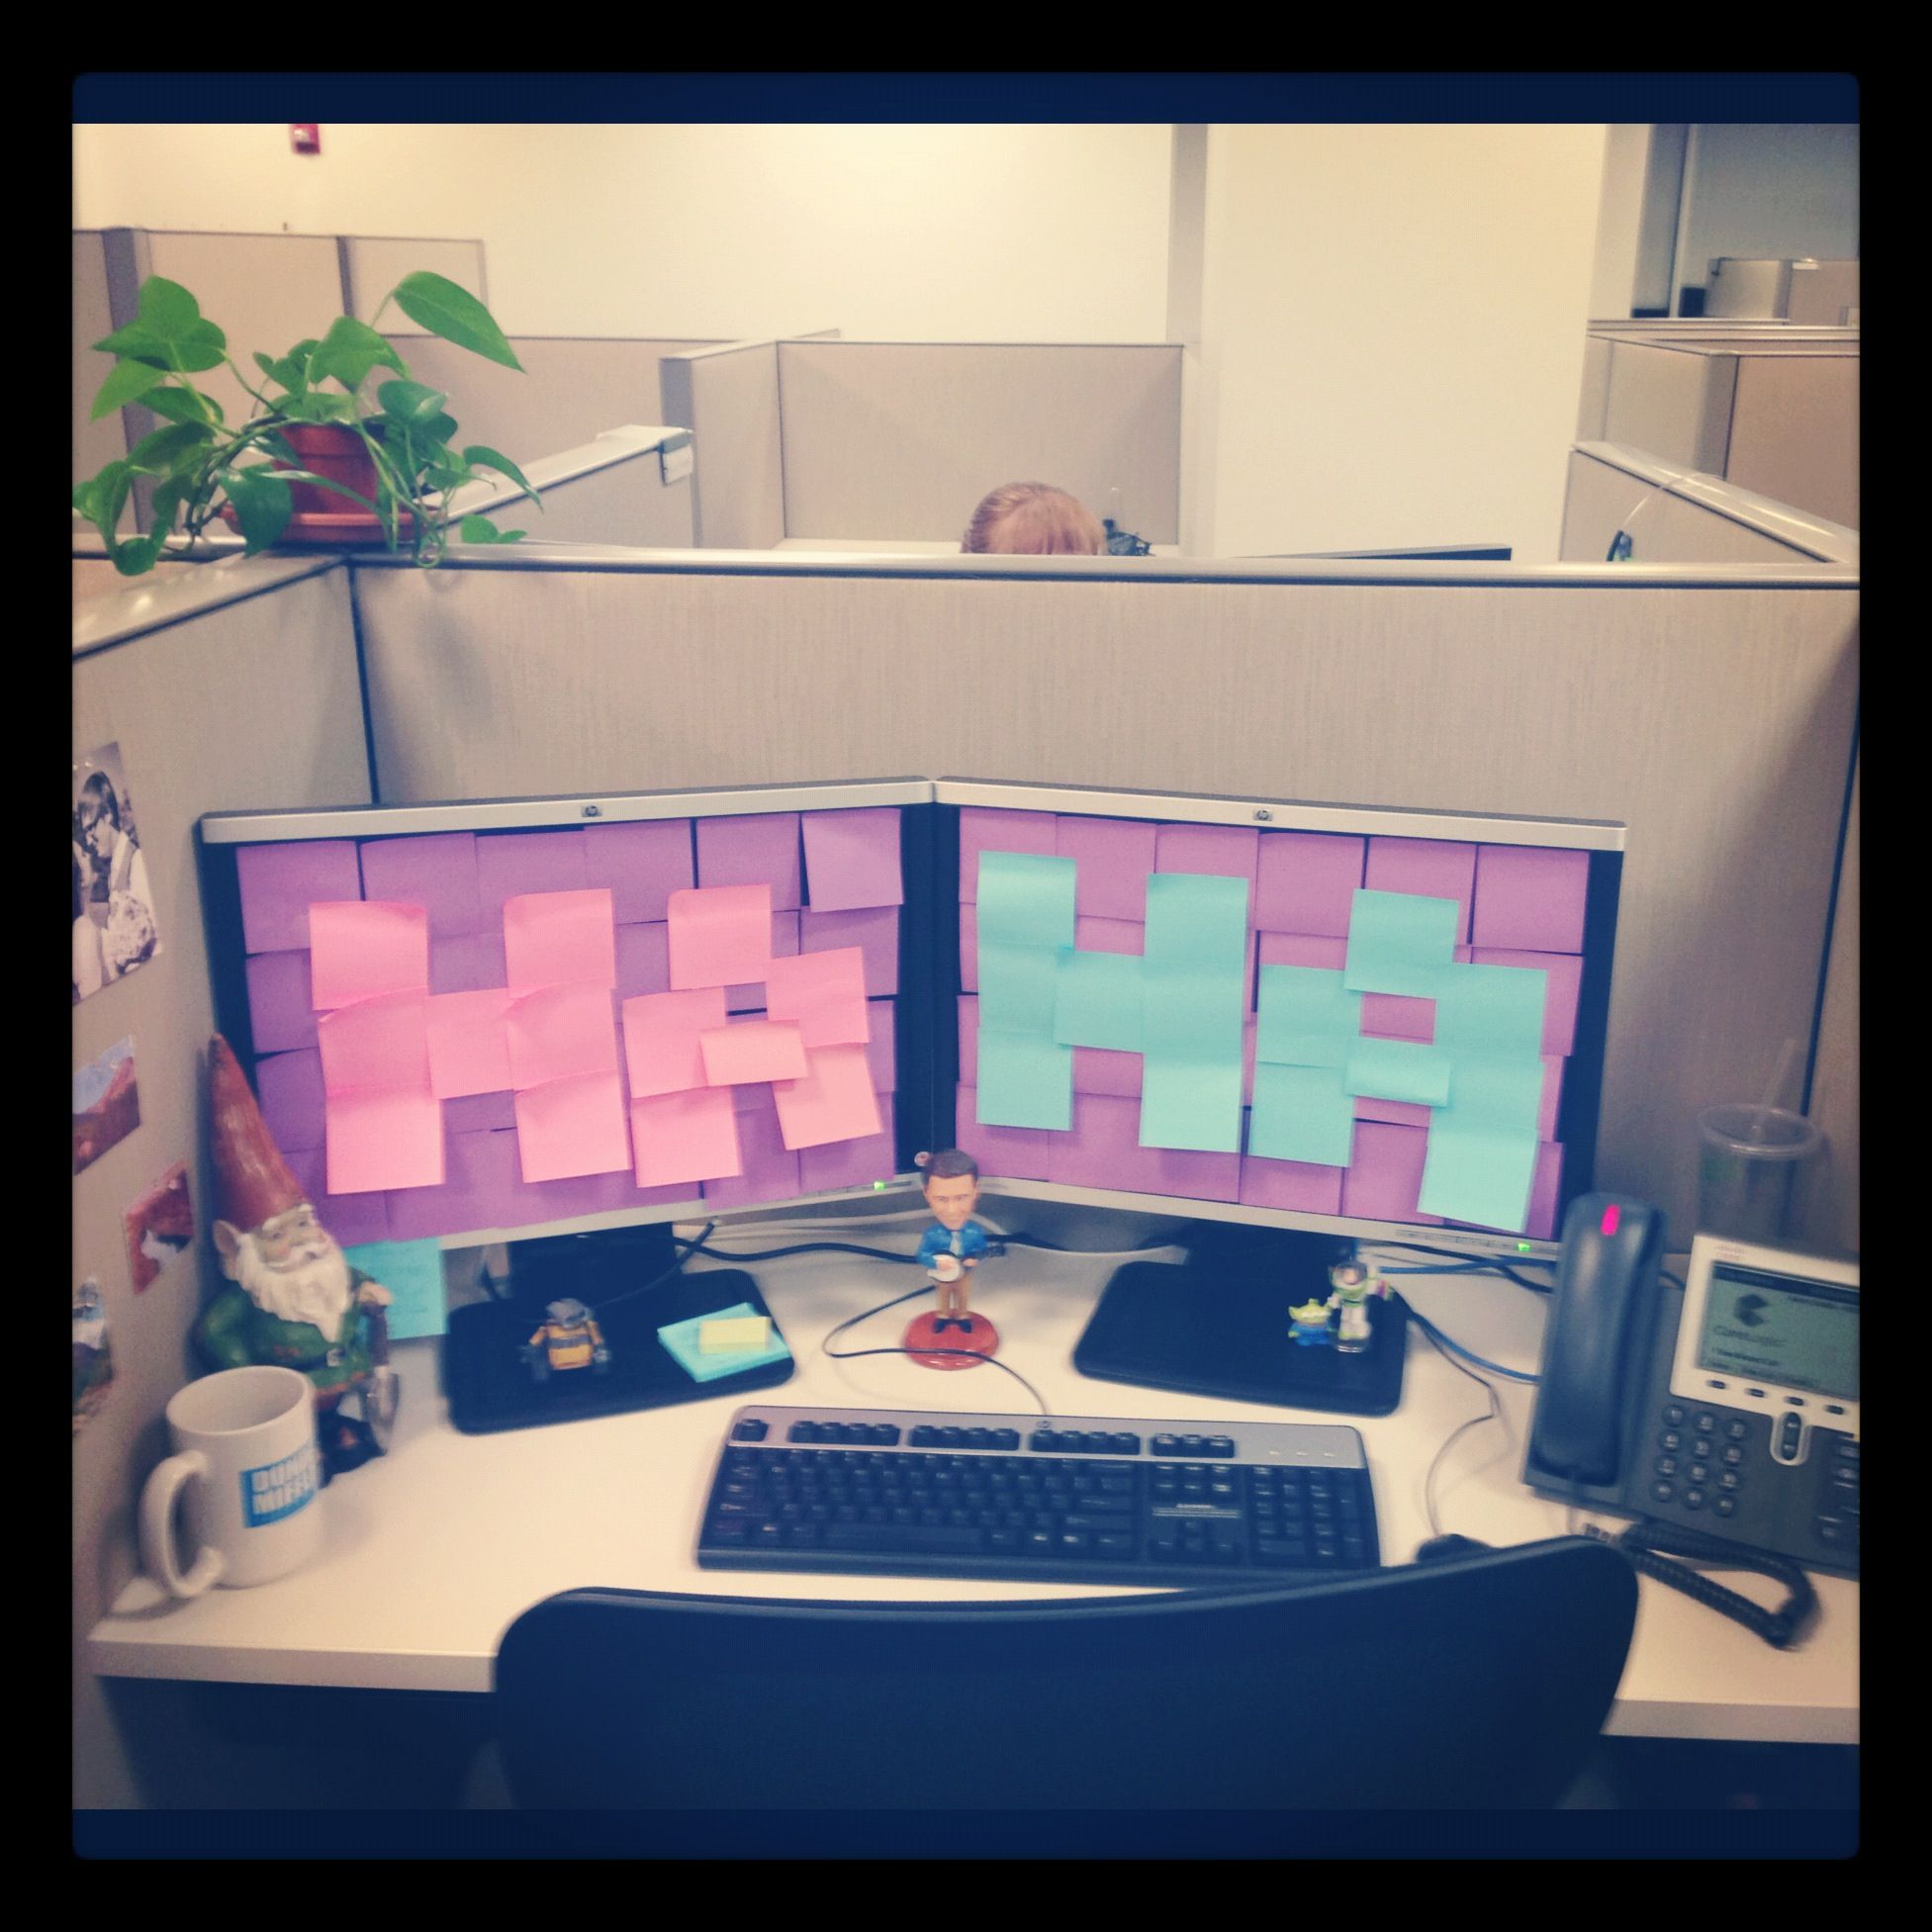 Office desk pranks ideas Birthday Office Prank Pinterest Office Prank Favorites Pranks Funny Office Pranks Funny Pranks